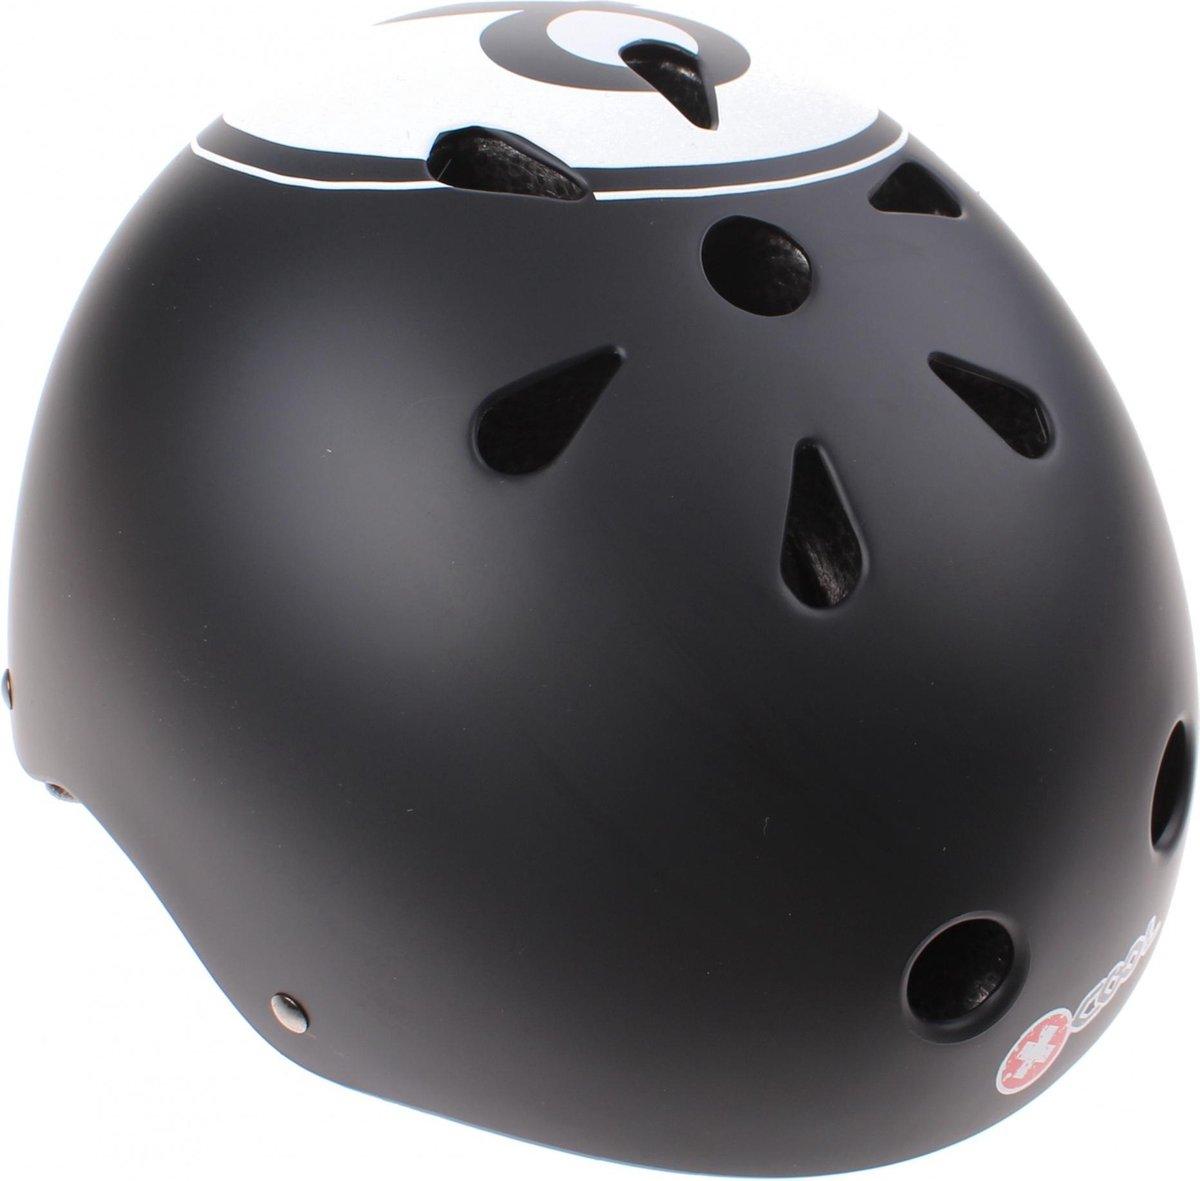 Cycle Tech Fietshelm Xcool 8-ball Zwart Maat 48/54 Cm